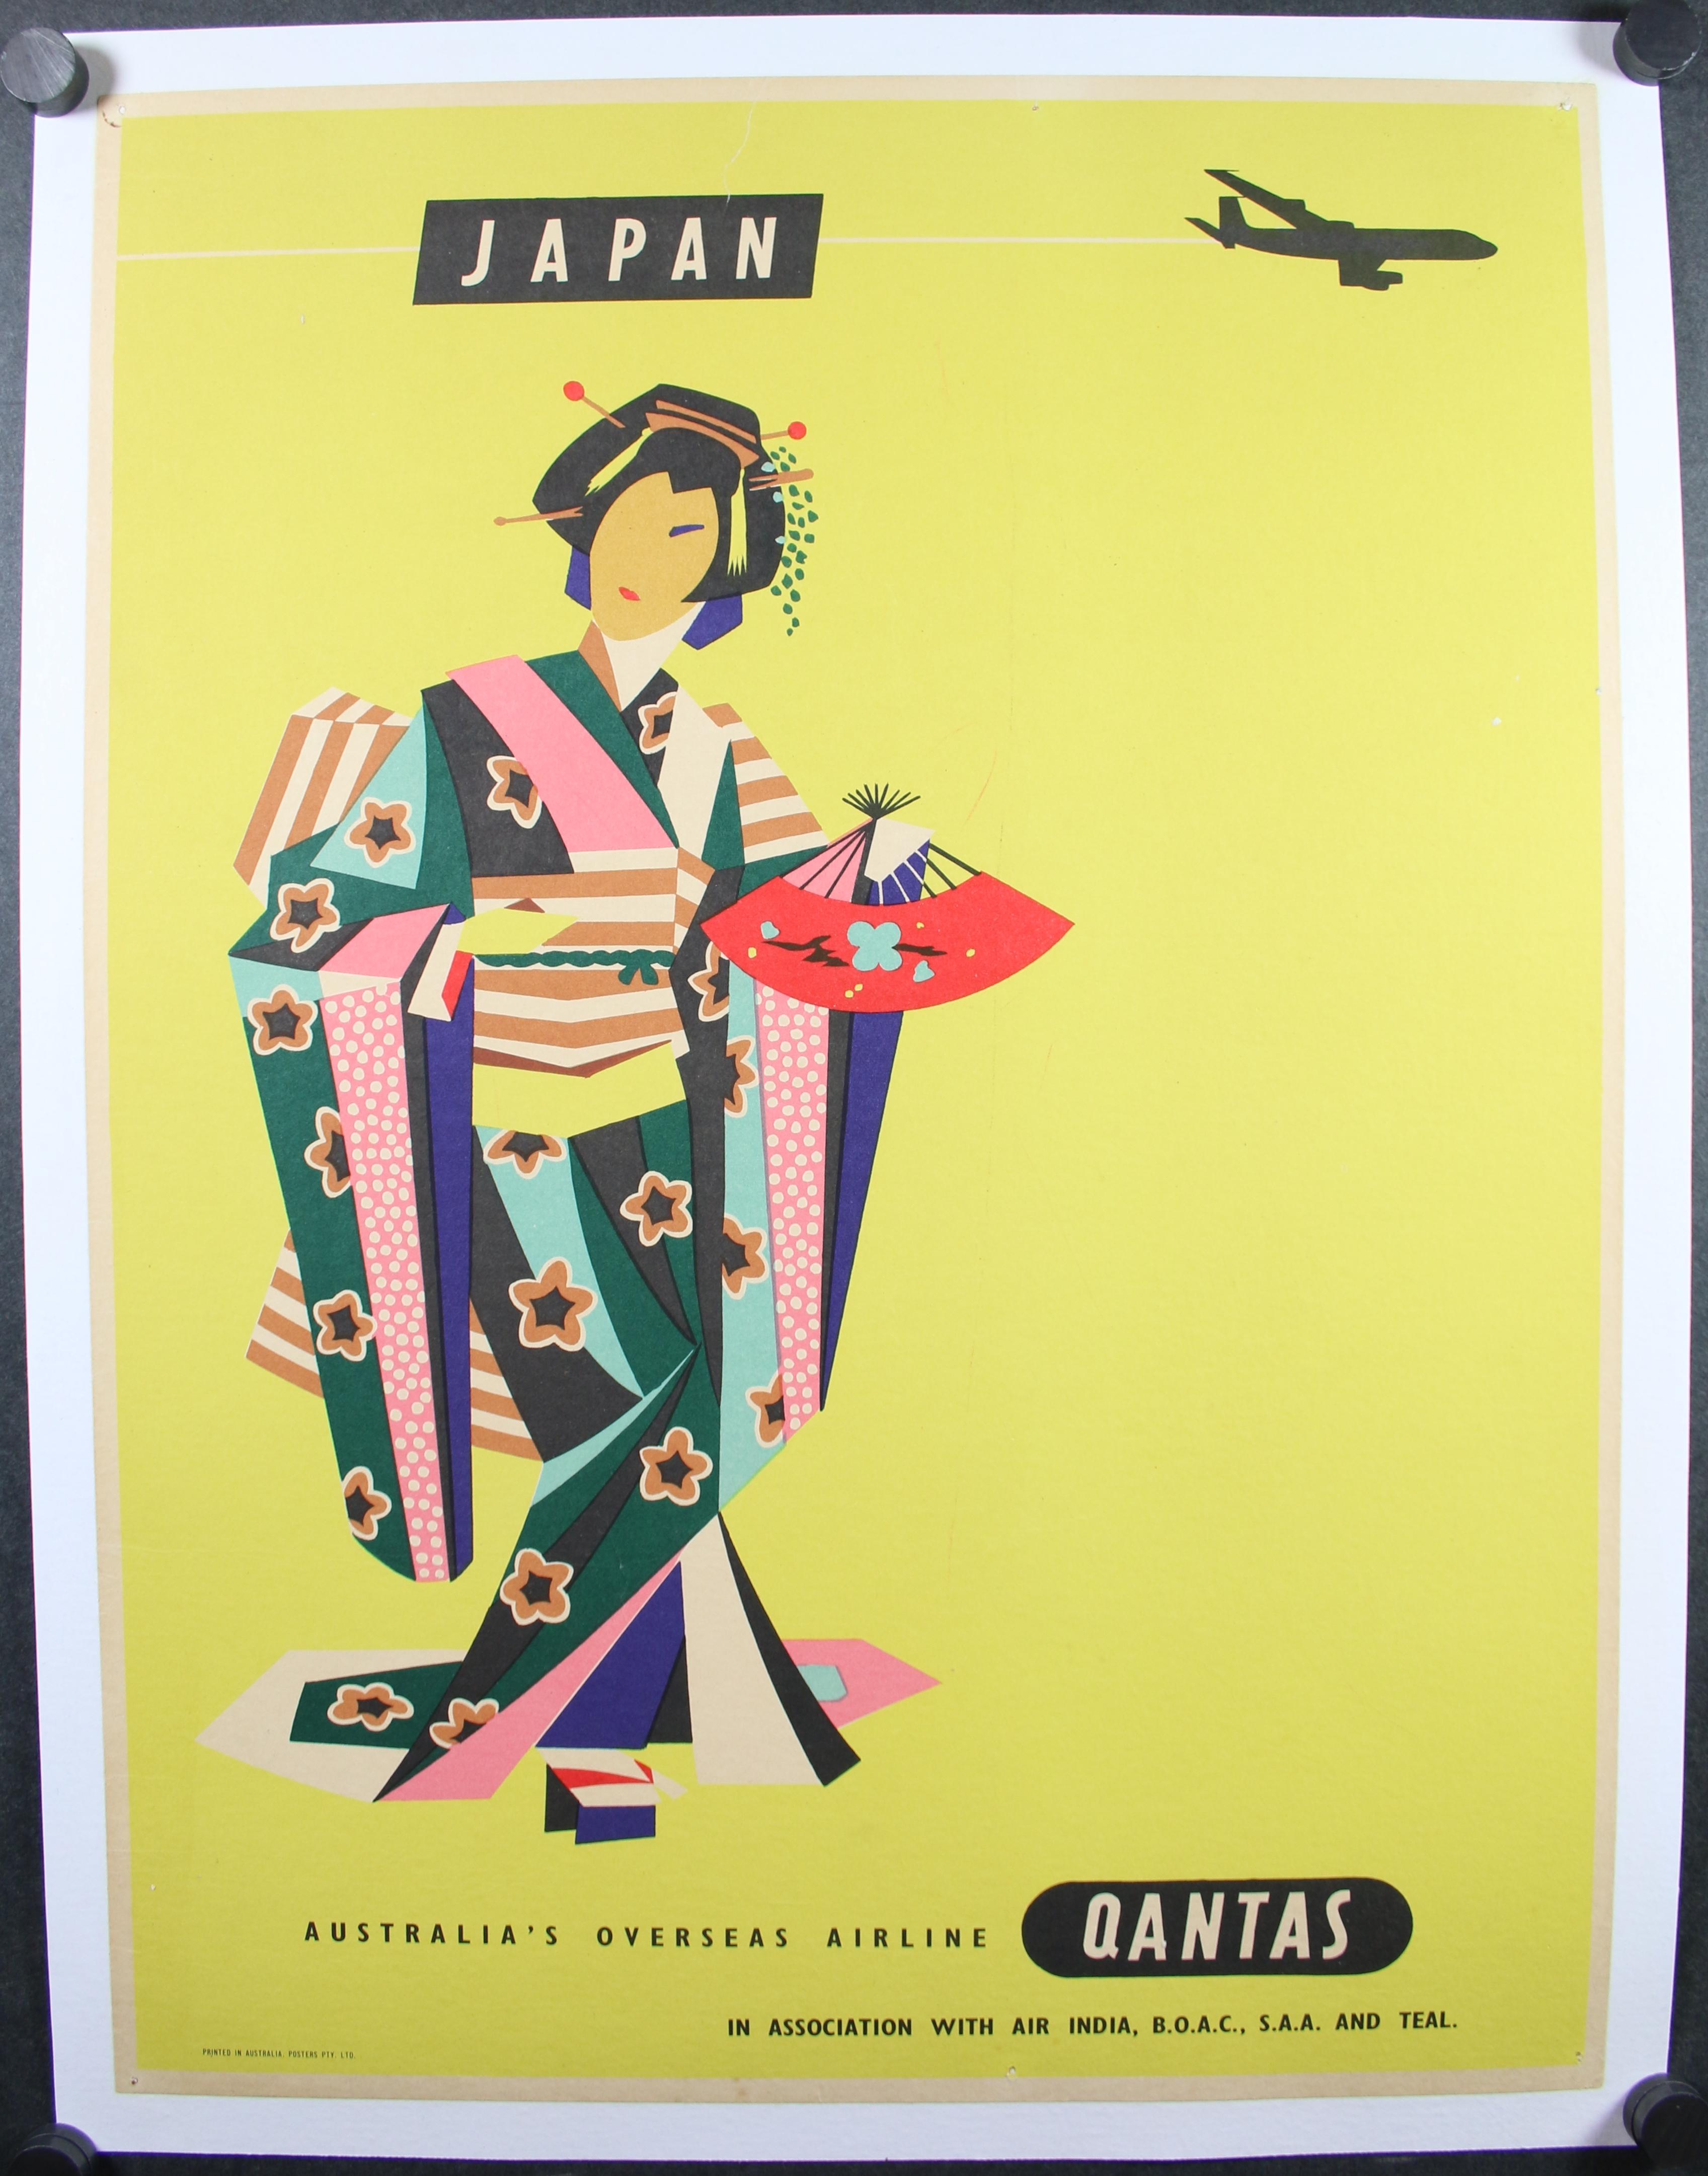 Qantas Japan 4774LB